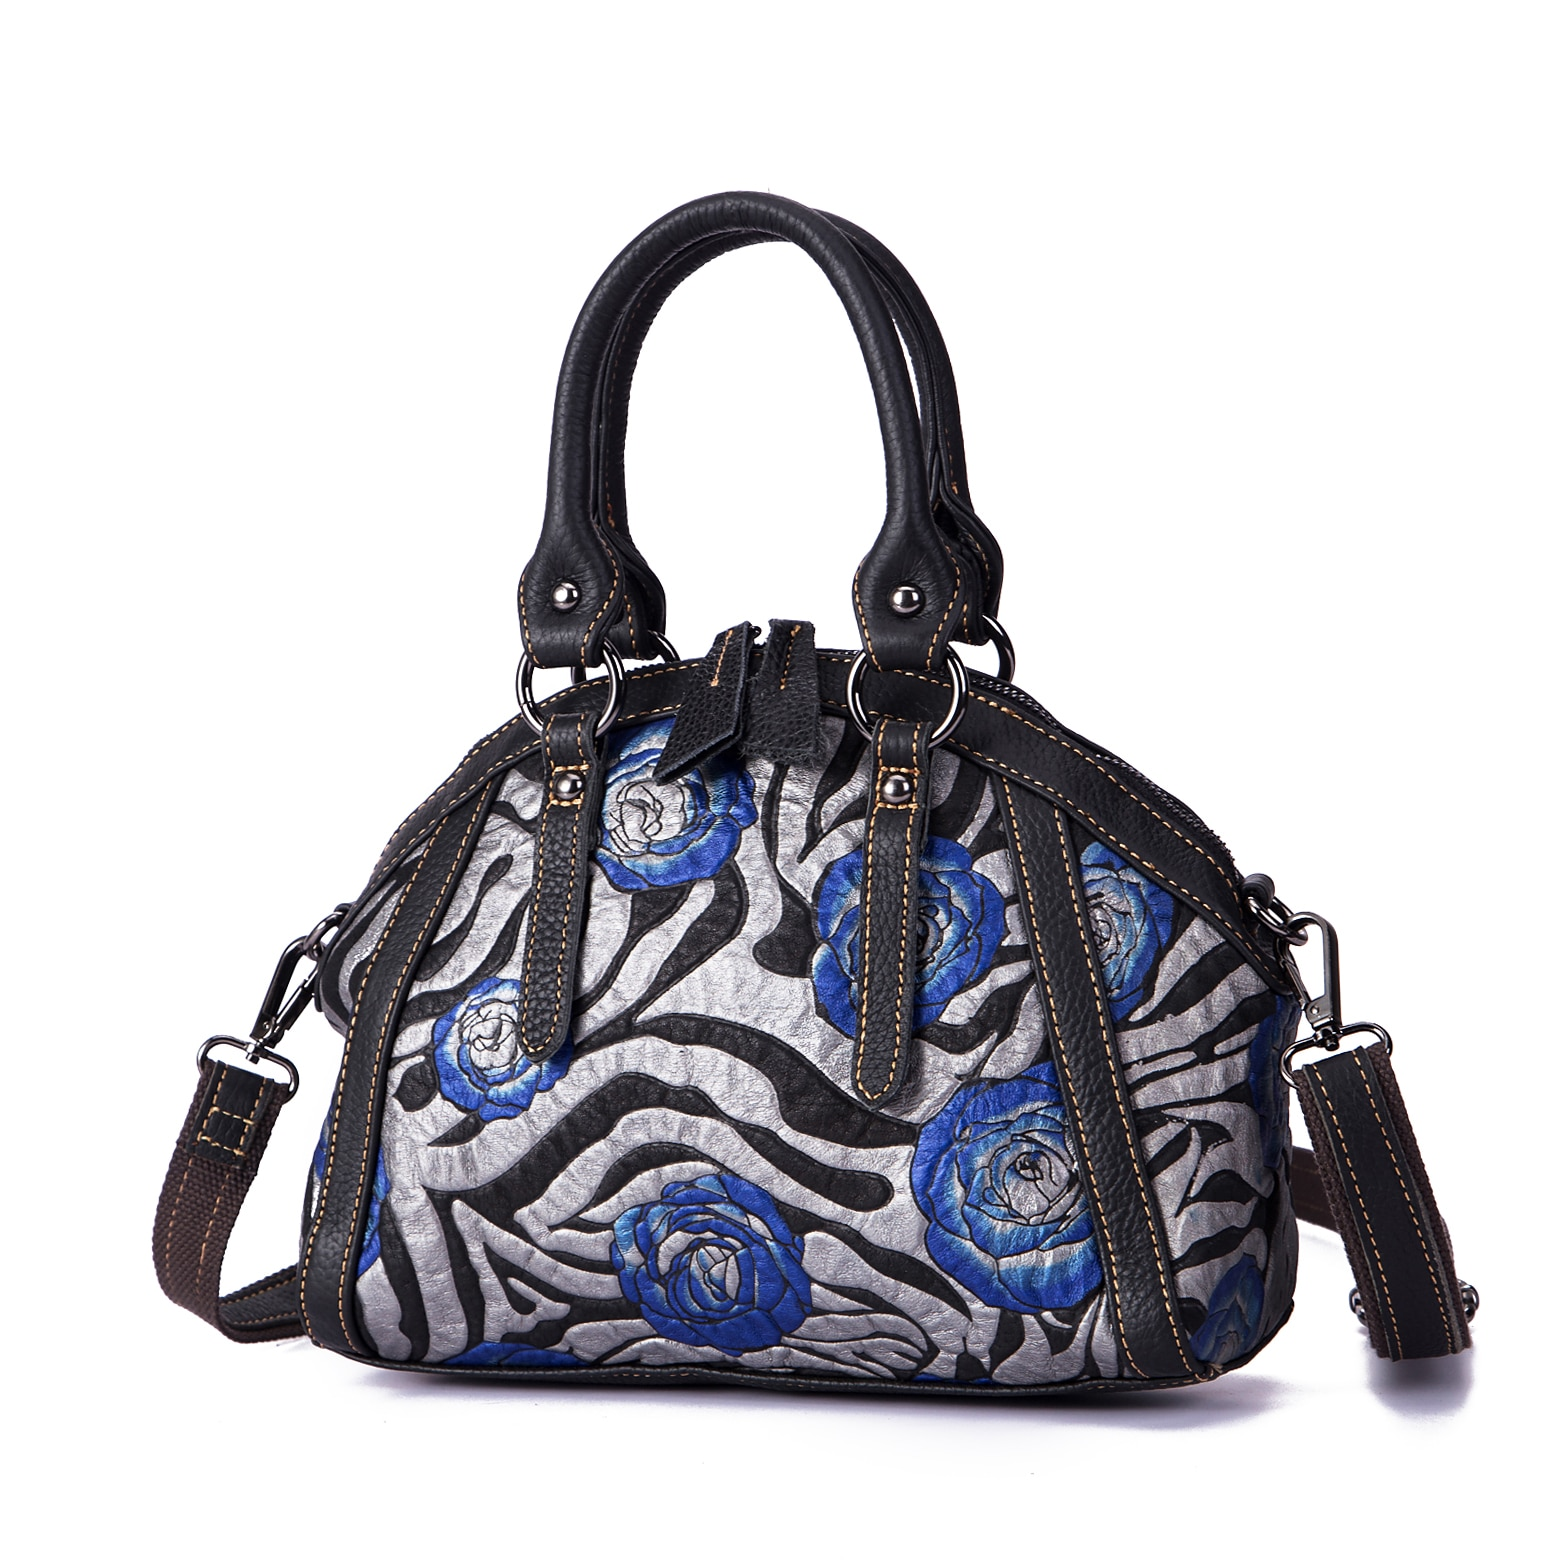 Emboss Original Leather Famous Brand Luxury Ladies Large Shopper handbag Shoulder bag Women Designer